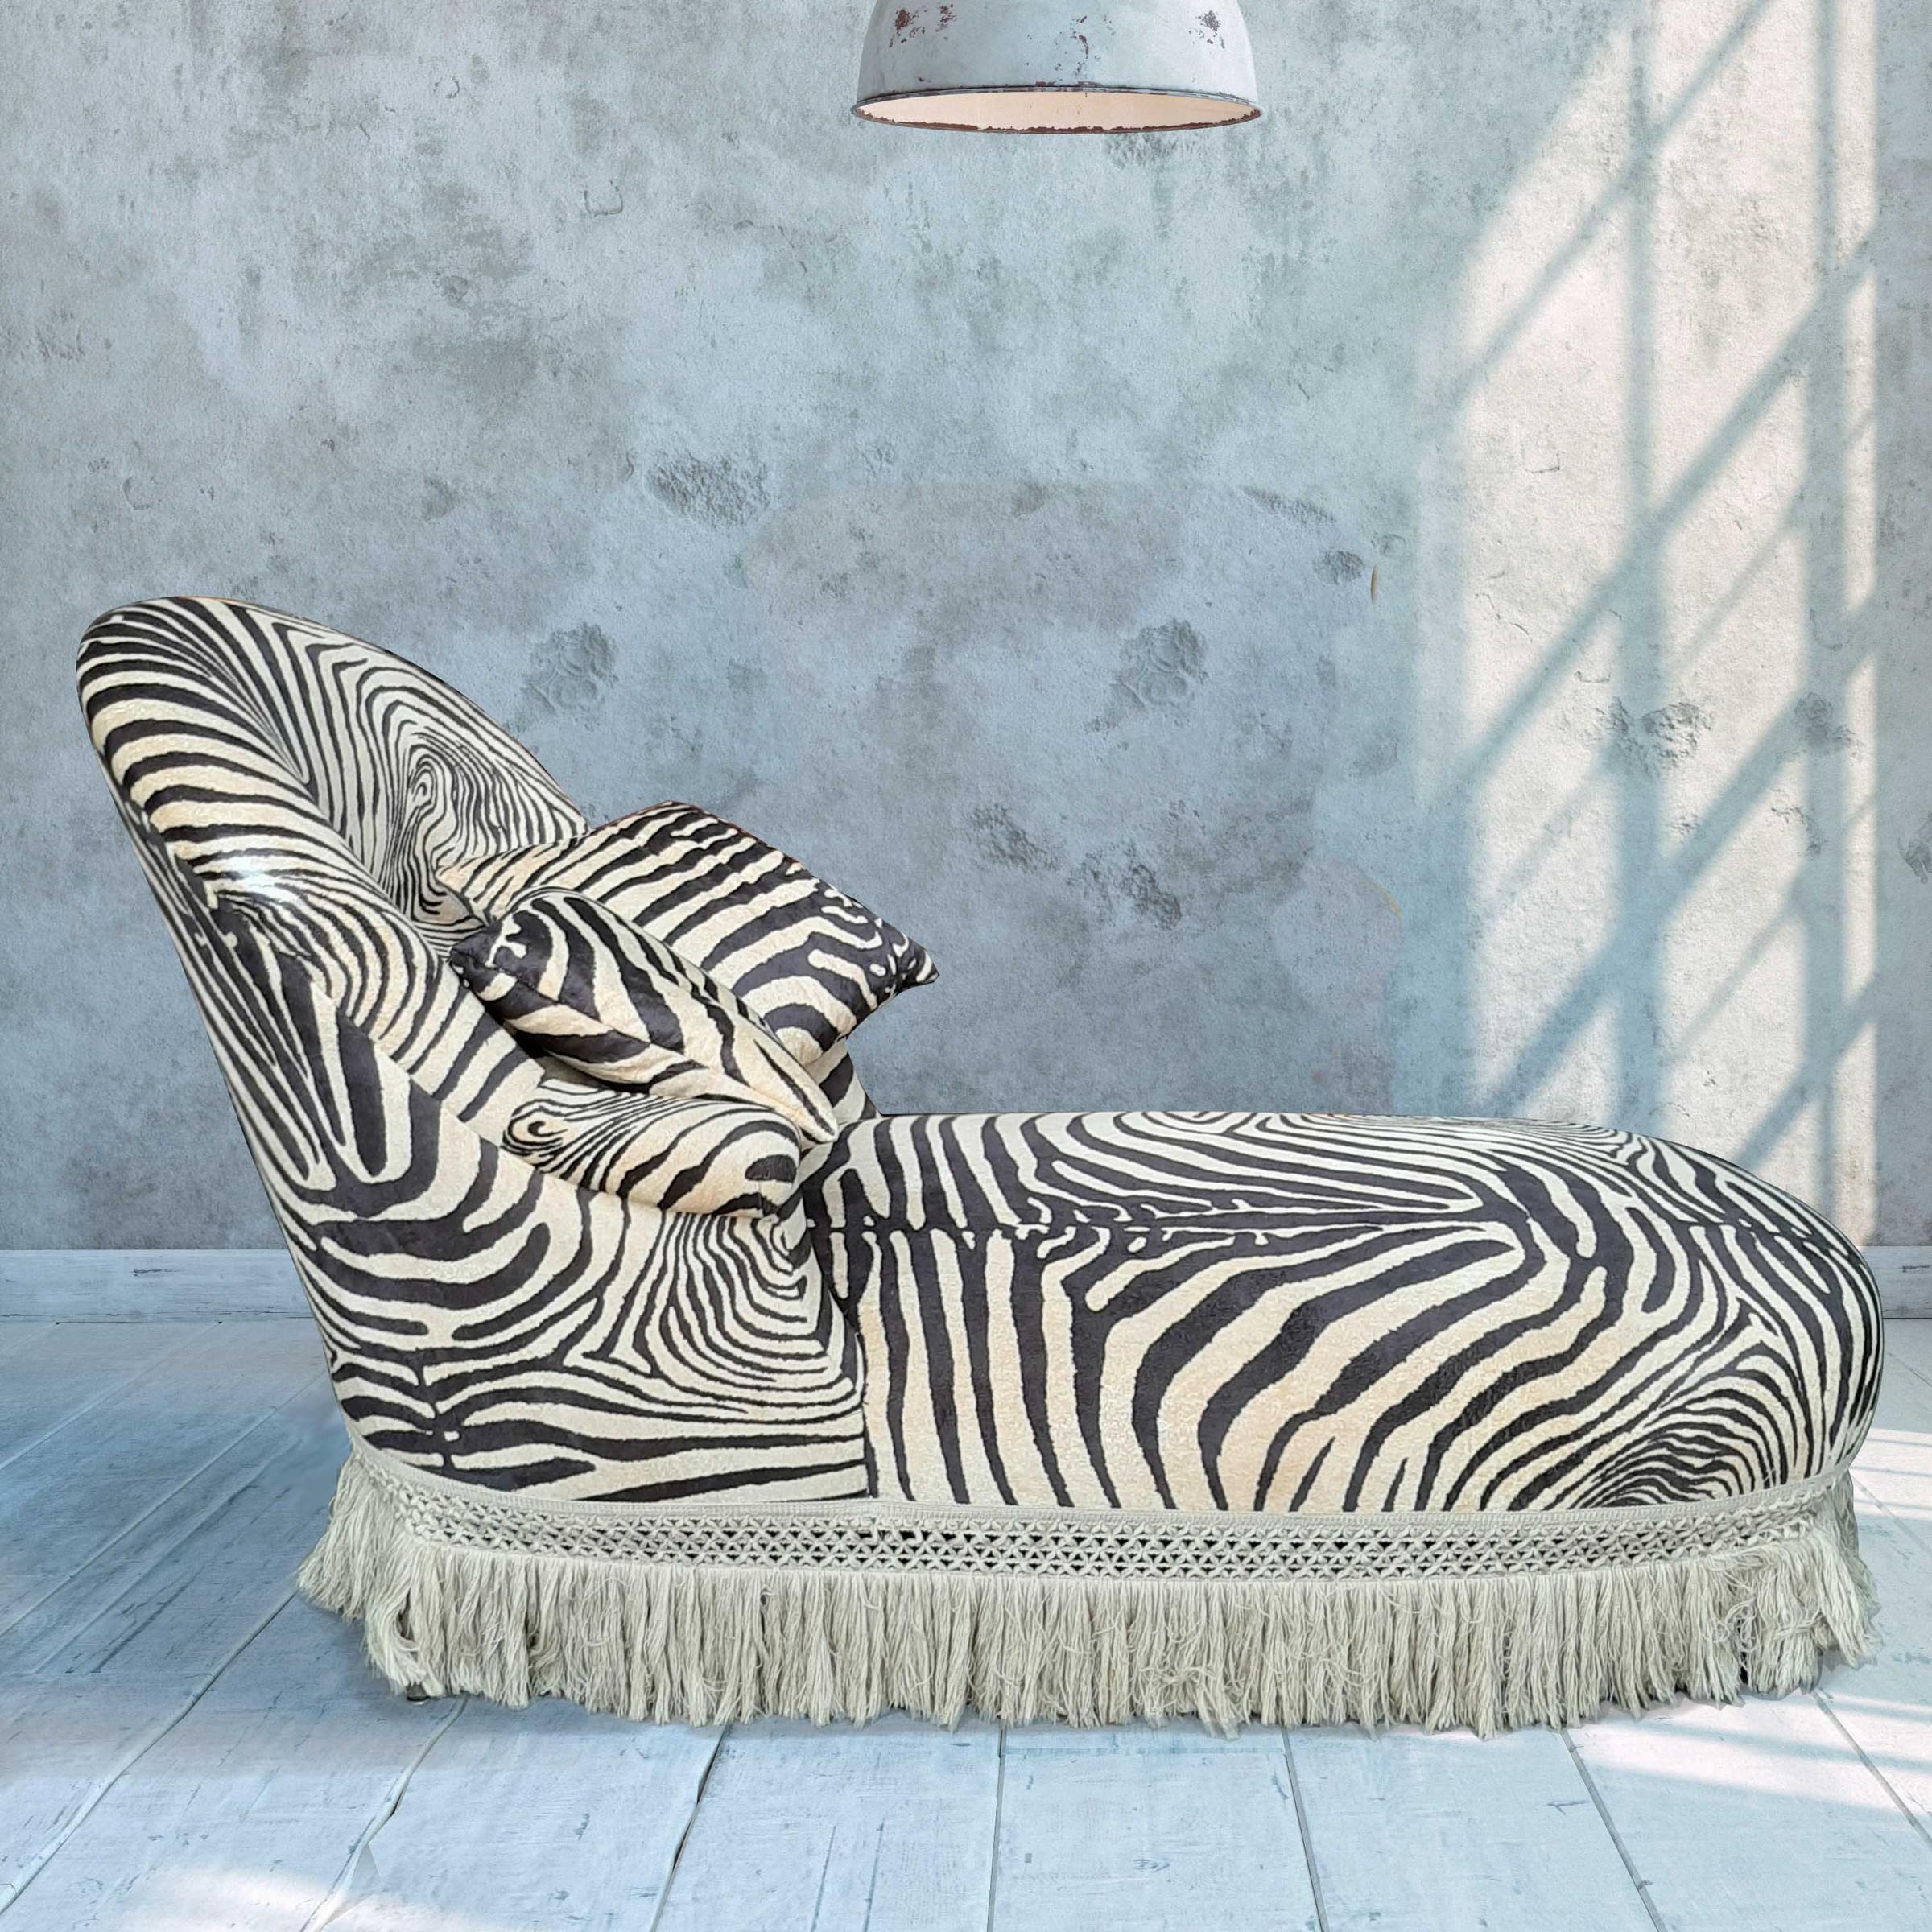 Fluwelen chaise longue met zebraprint